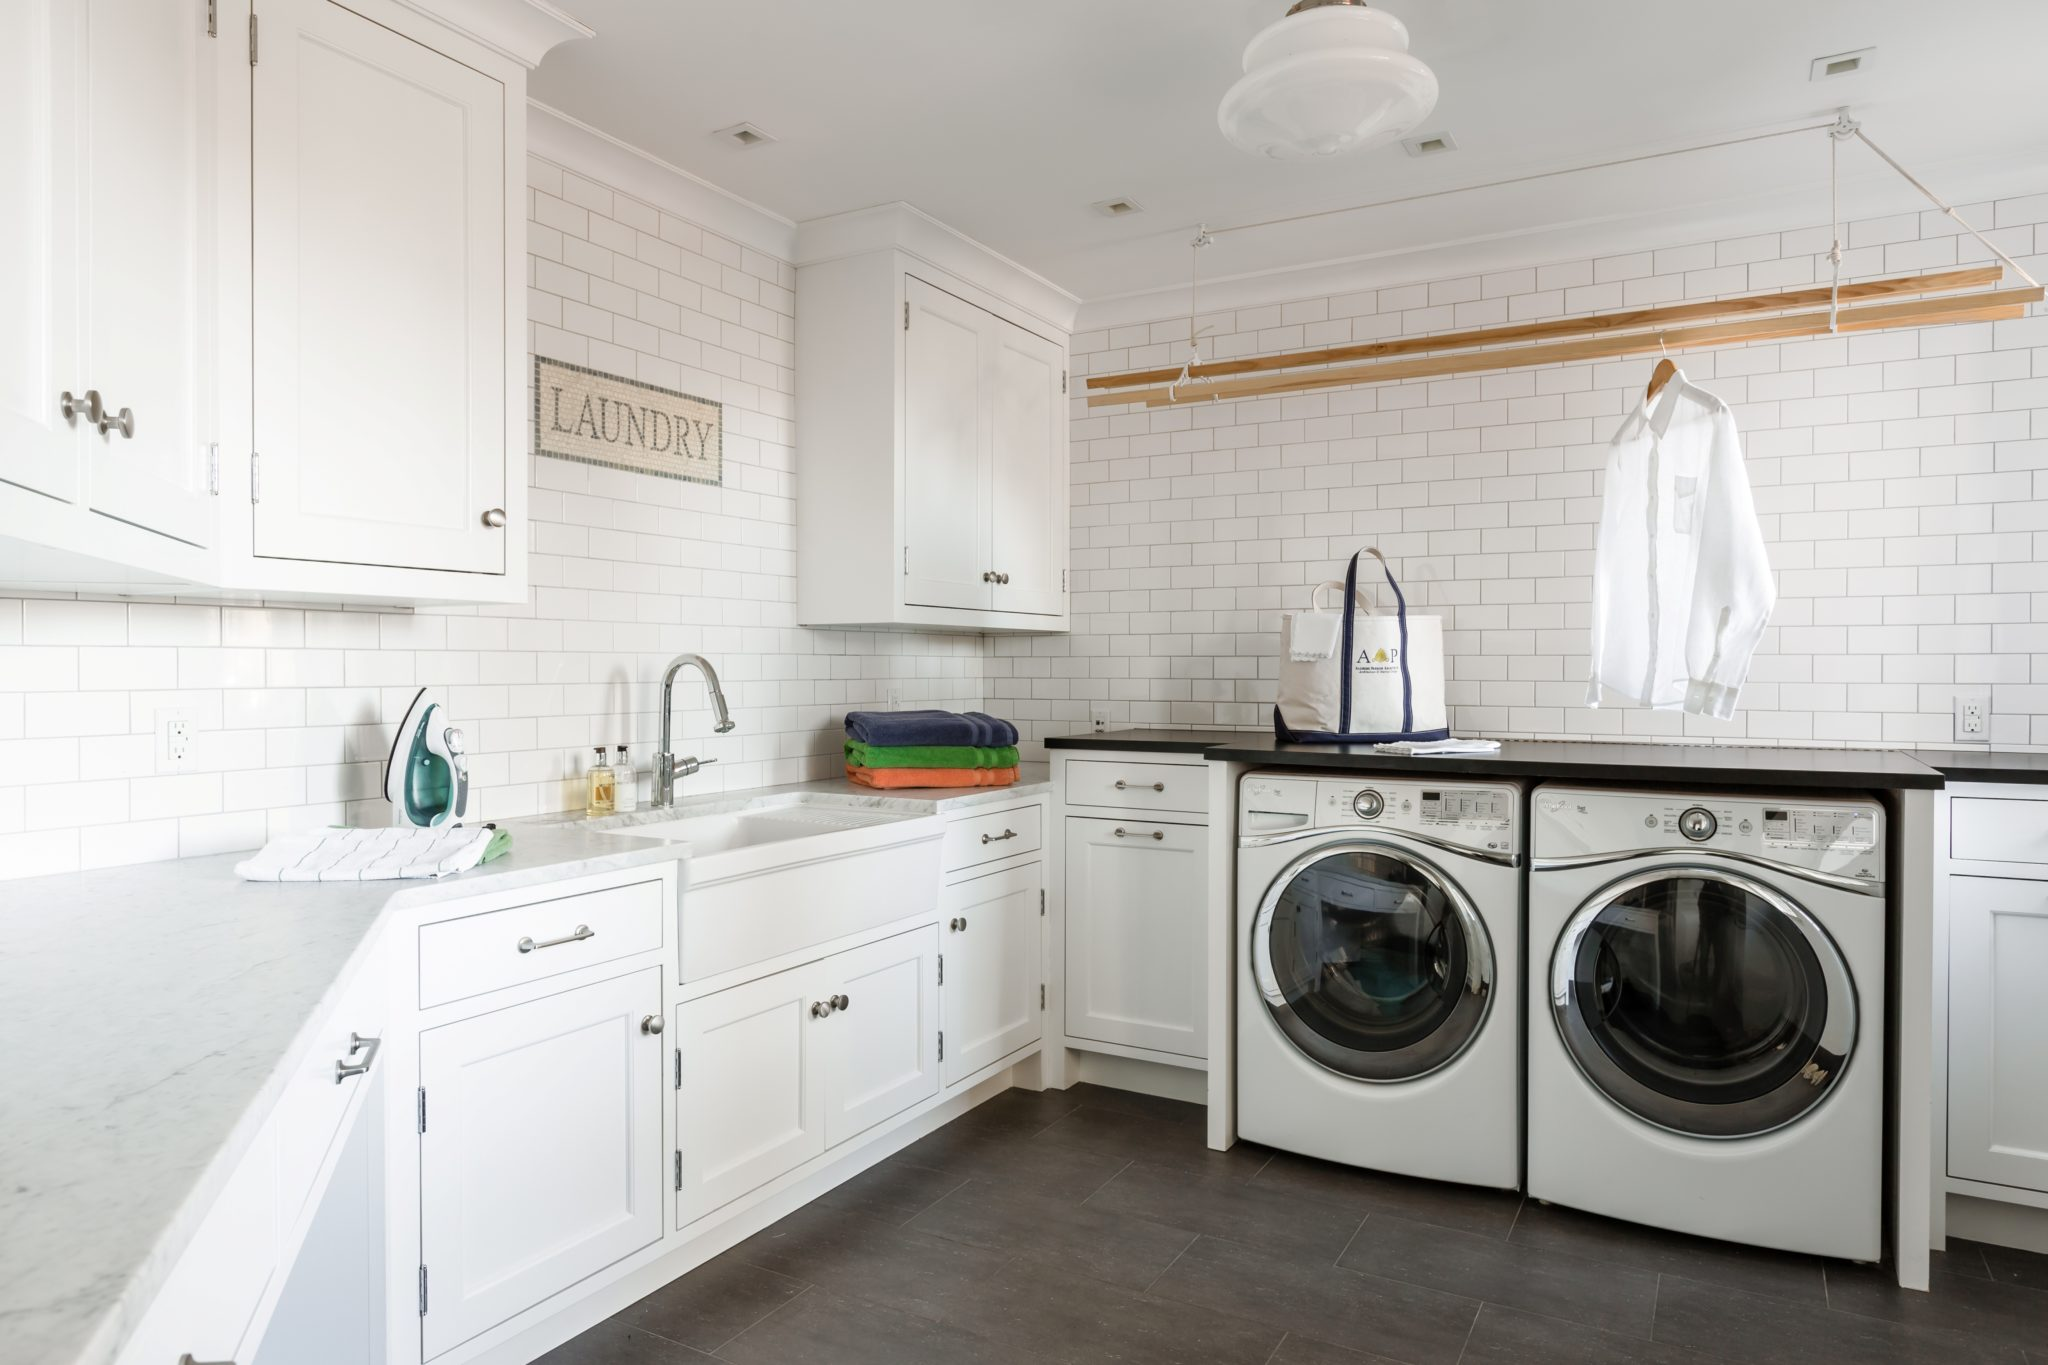 Laundry Room by Alisberg Parker Architects